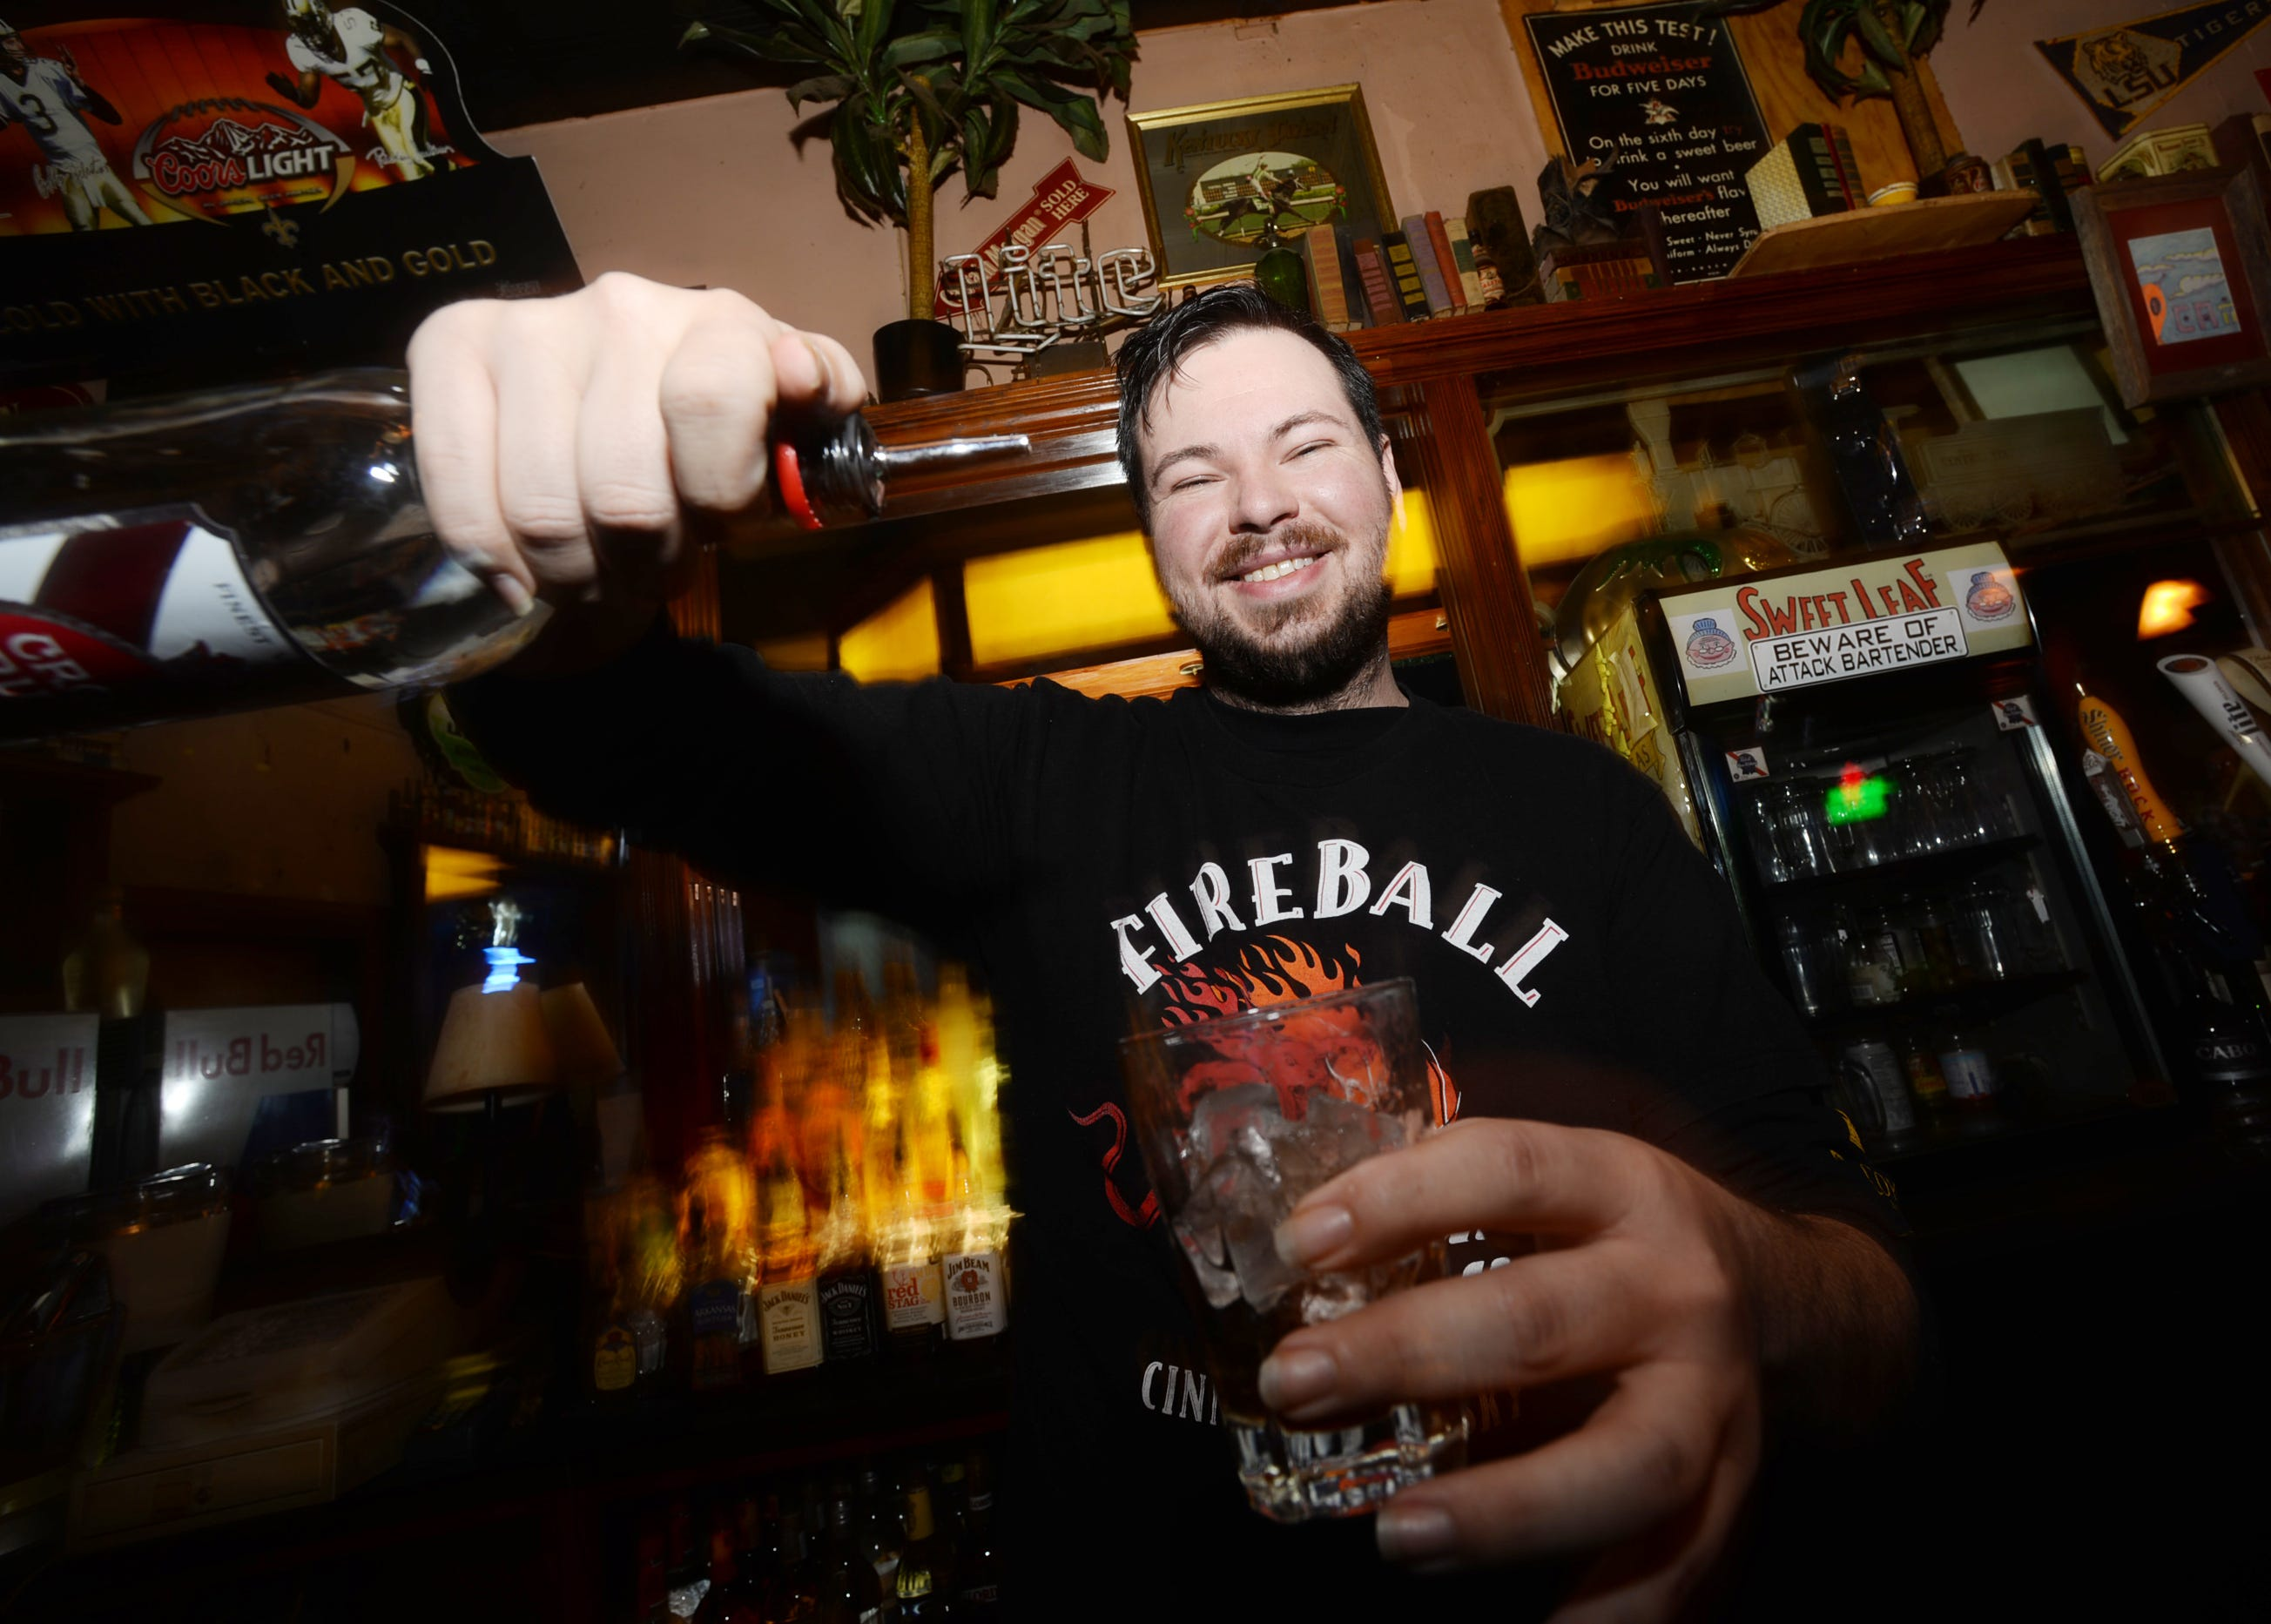 Shrevport louisina gay bars